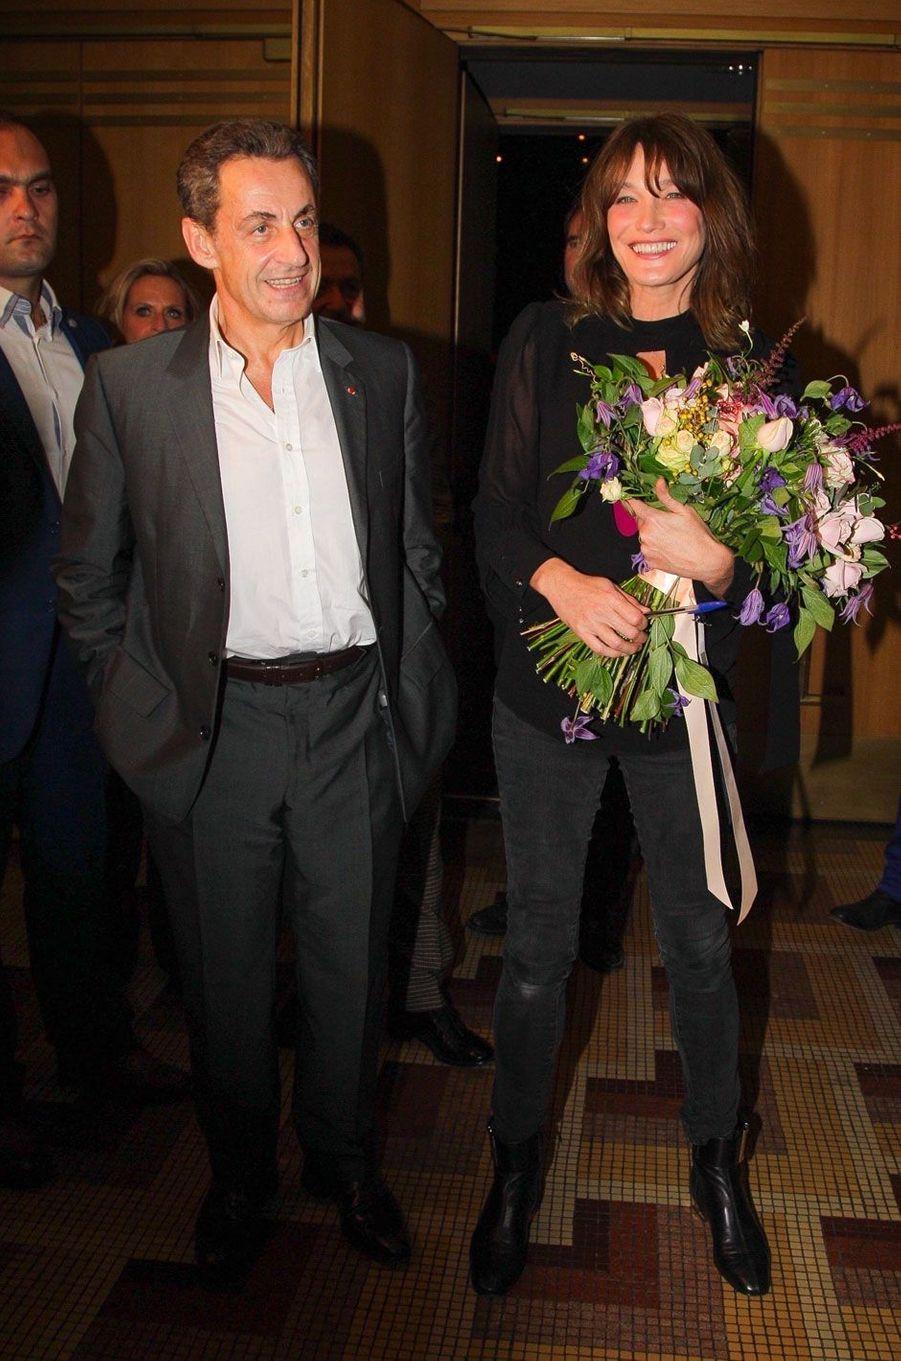 Nicolas Sarkozy et Carla Bruni à la sortie de l'un de ses concerts le 23 octobre 2017